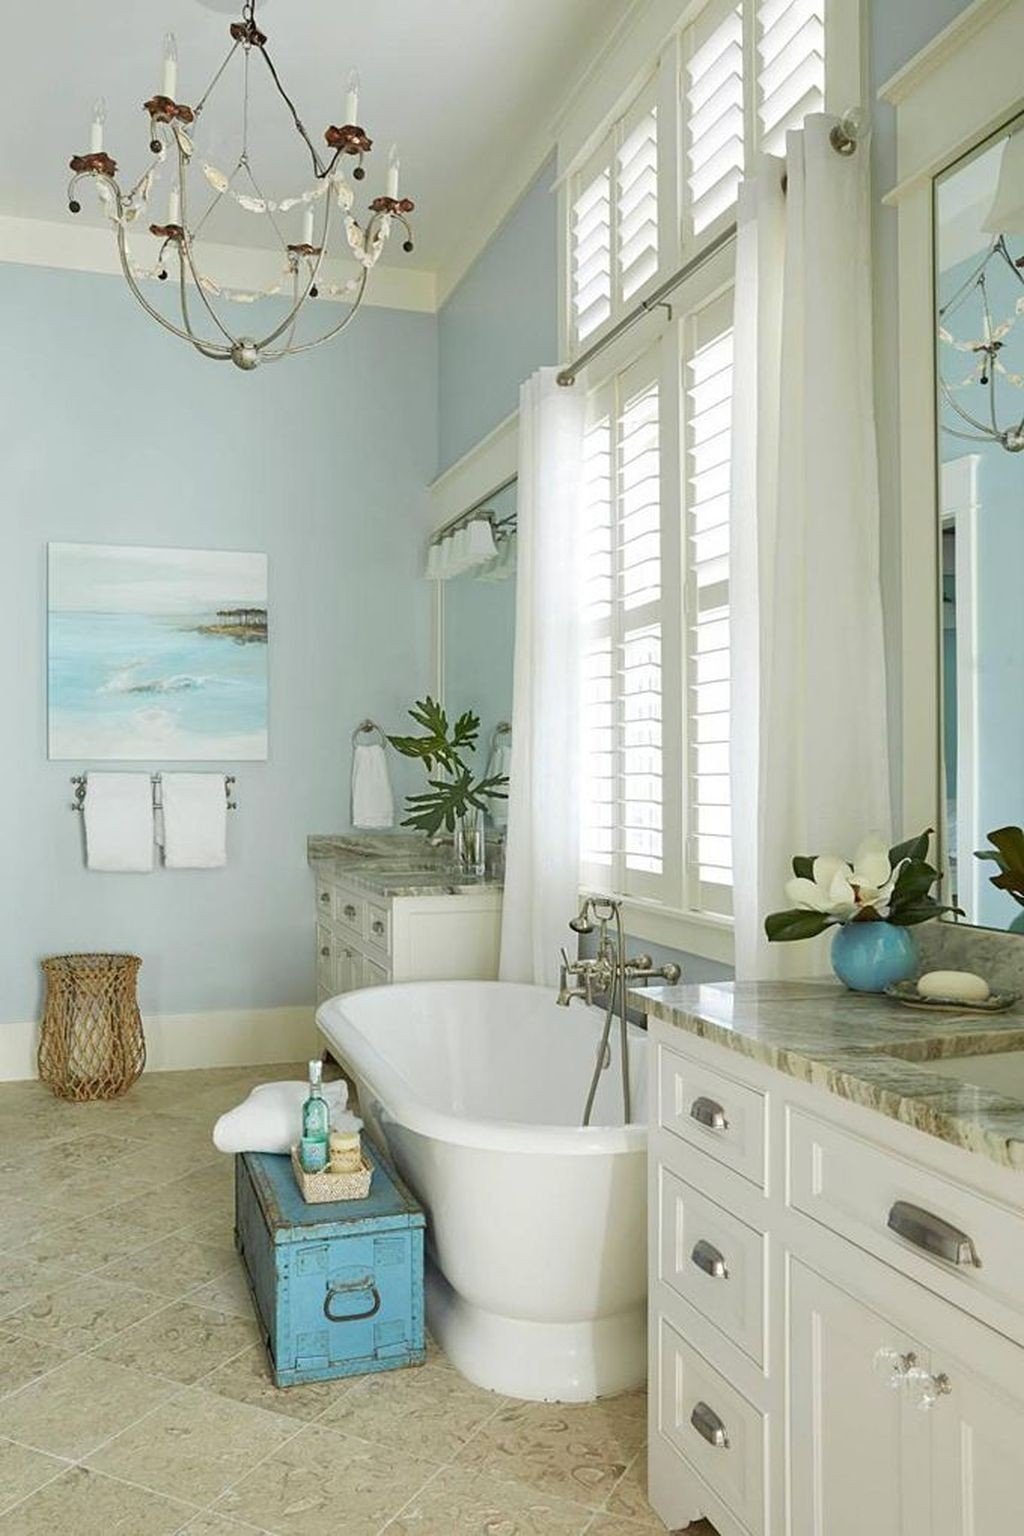 Nice bathroom by the sea